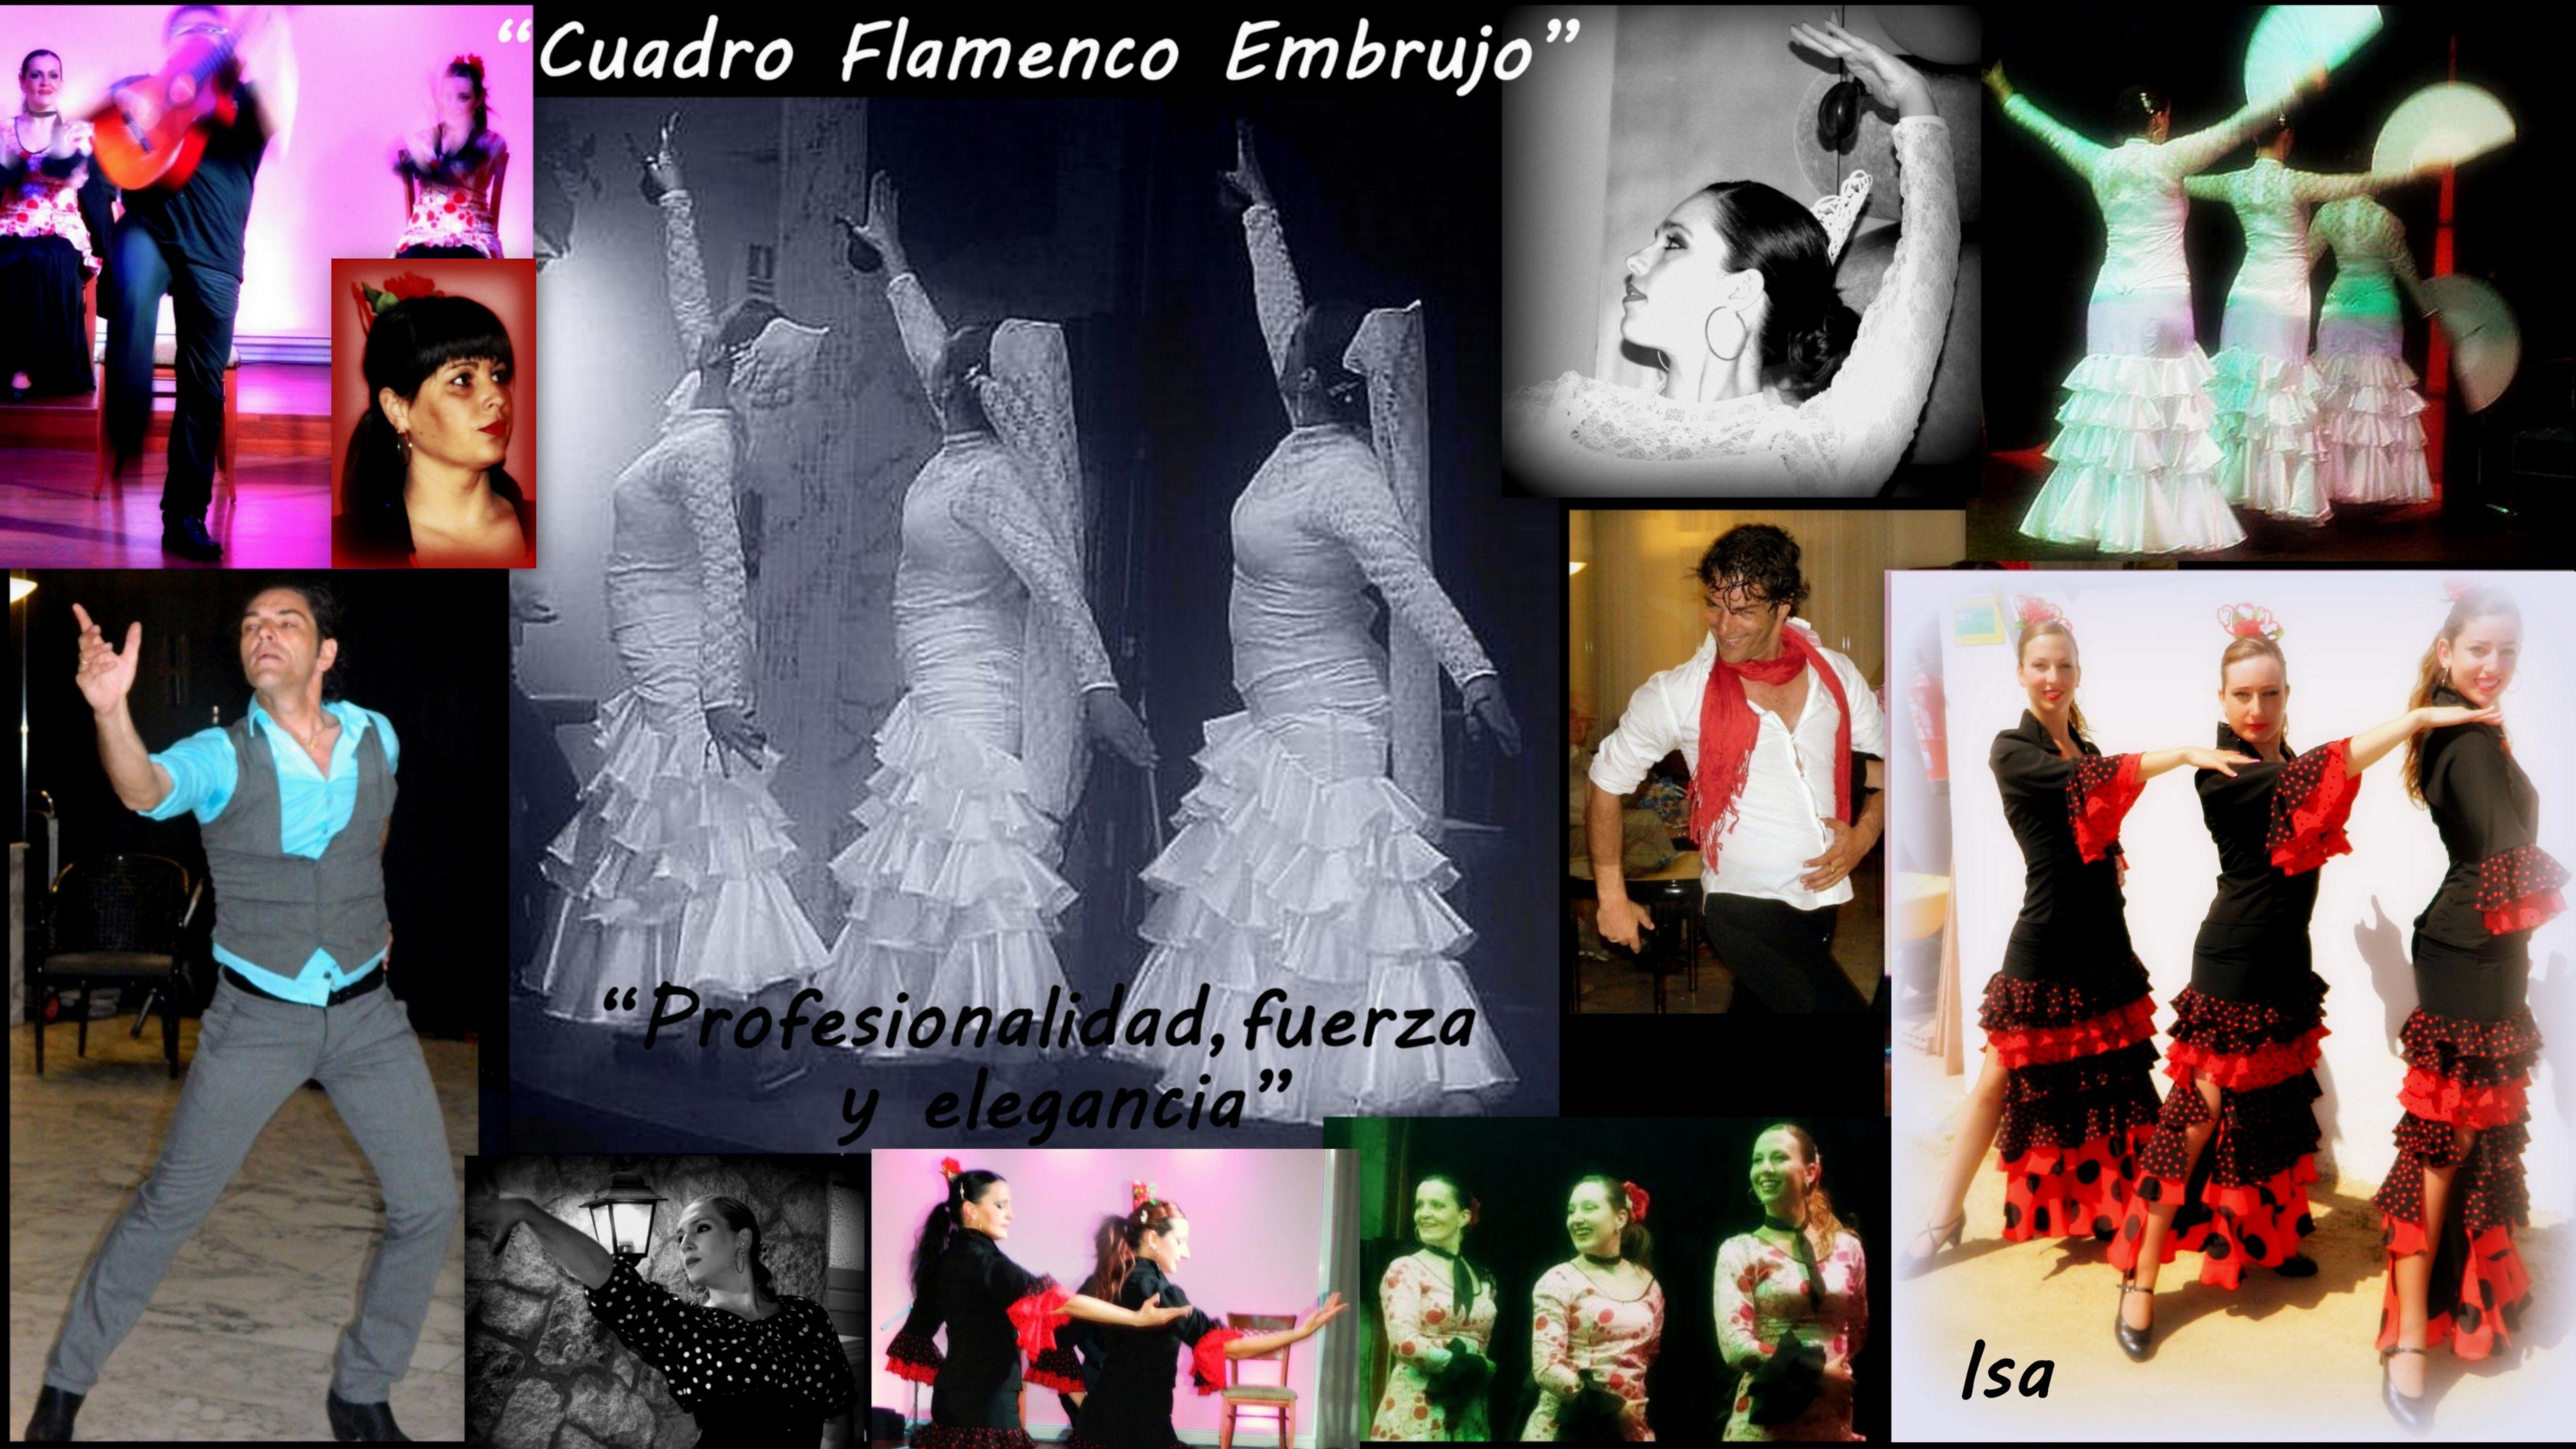 Cuadro Flamenco Embrujo